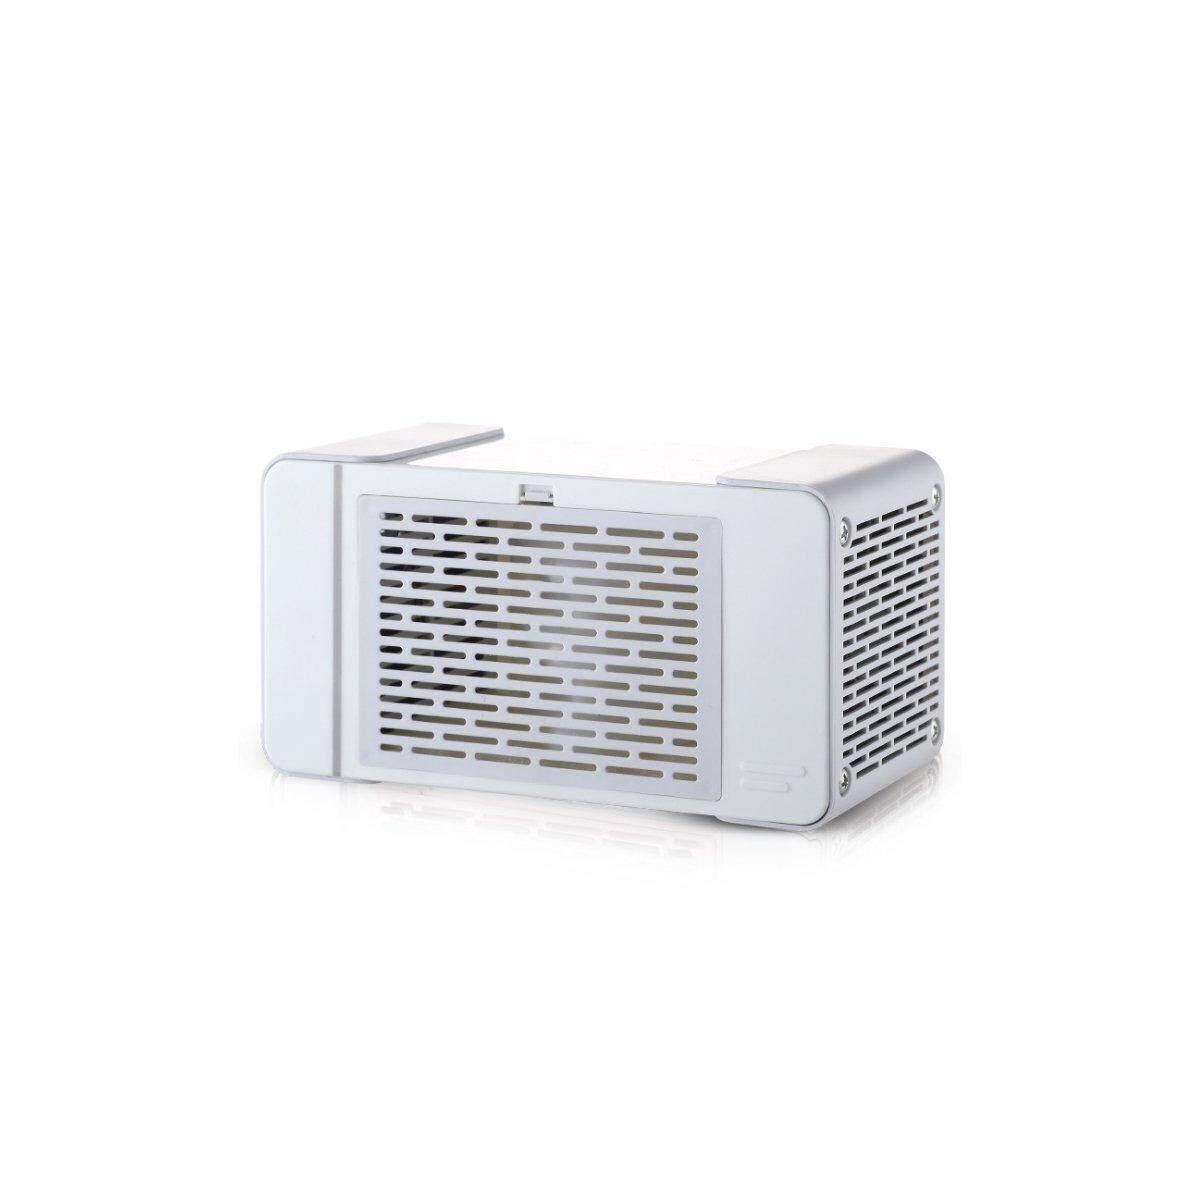 Mini Portable Evaporative Air Conditioner Cooler Fan Electric Home Office